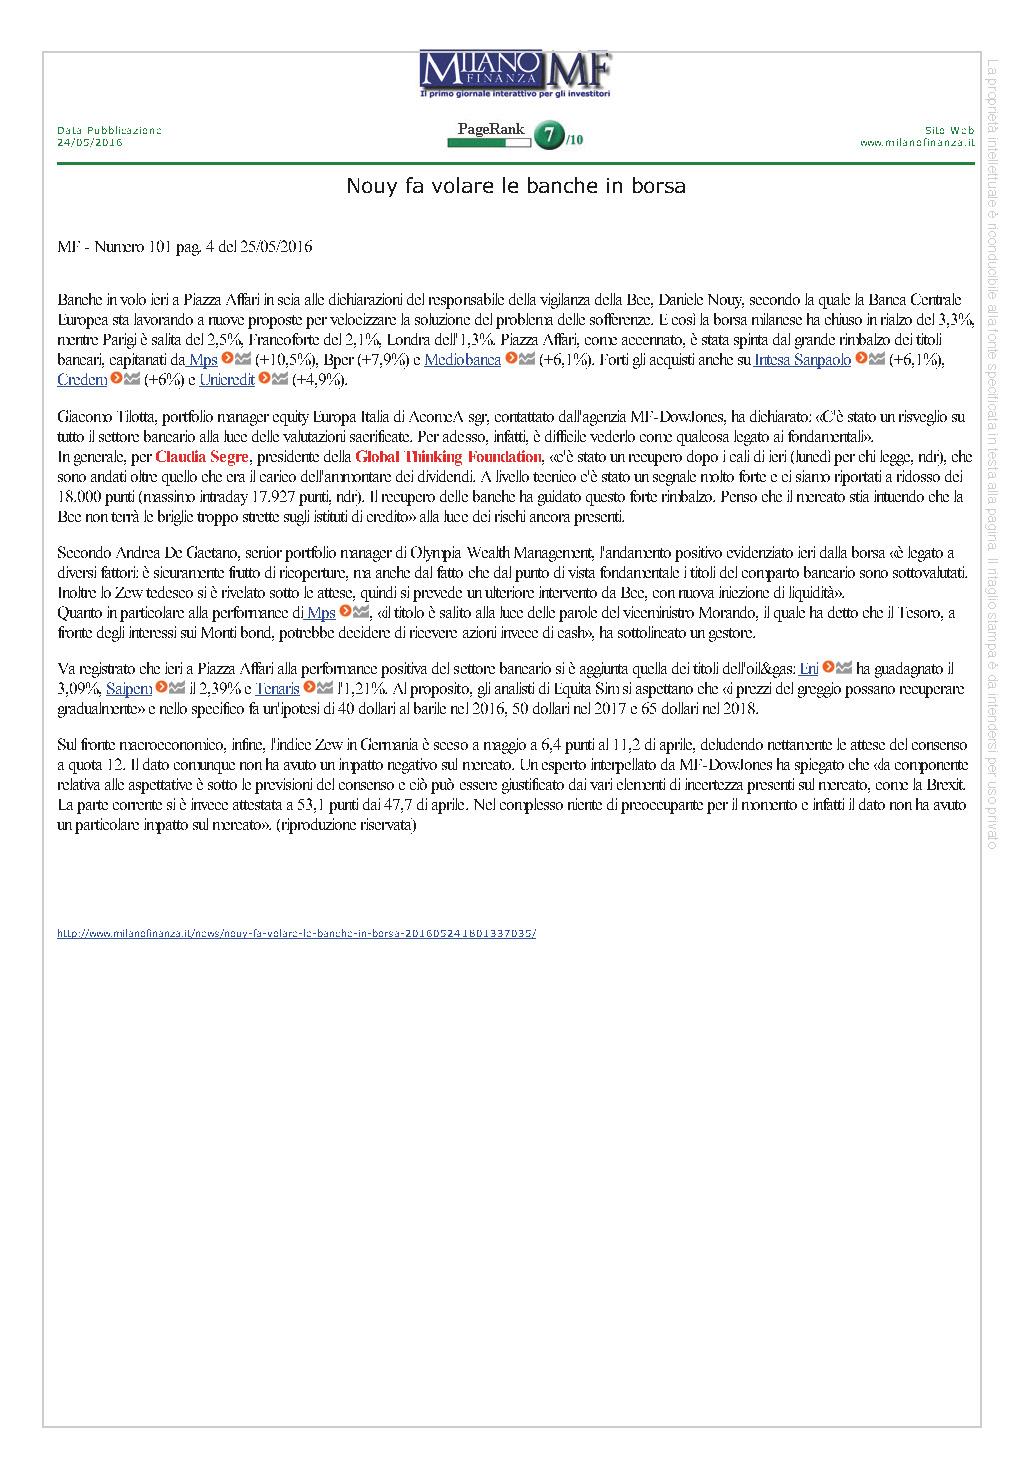 2016-05-24 milanofinanza.it